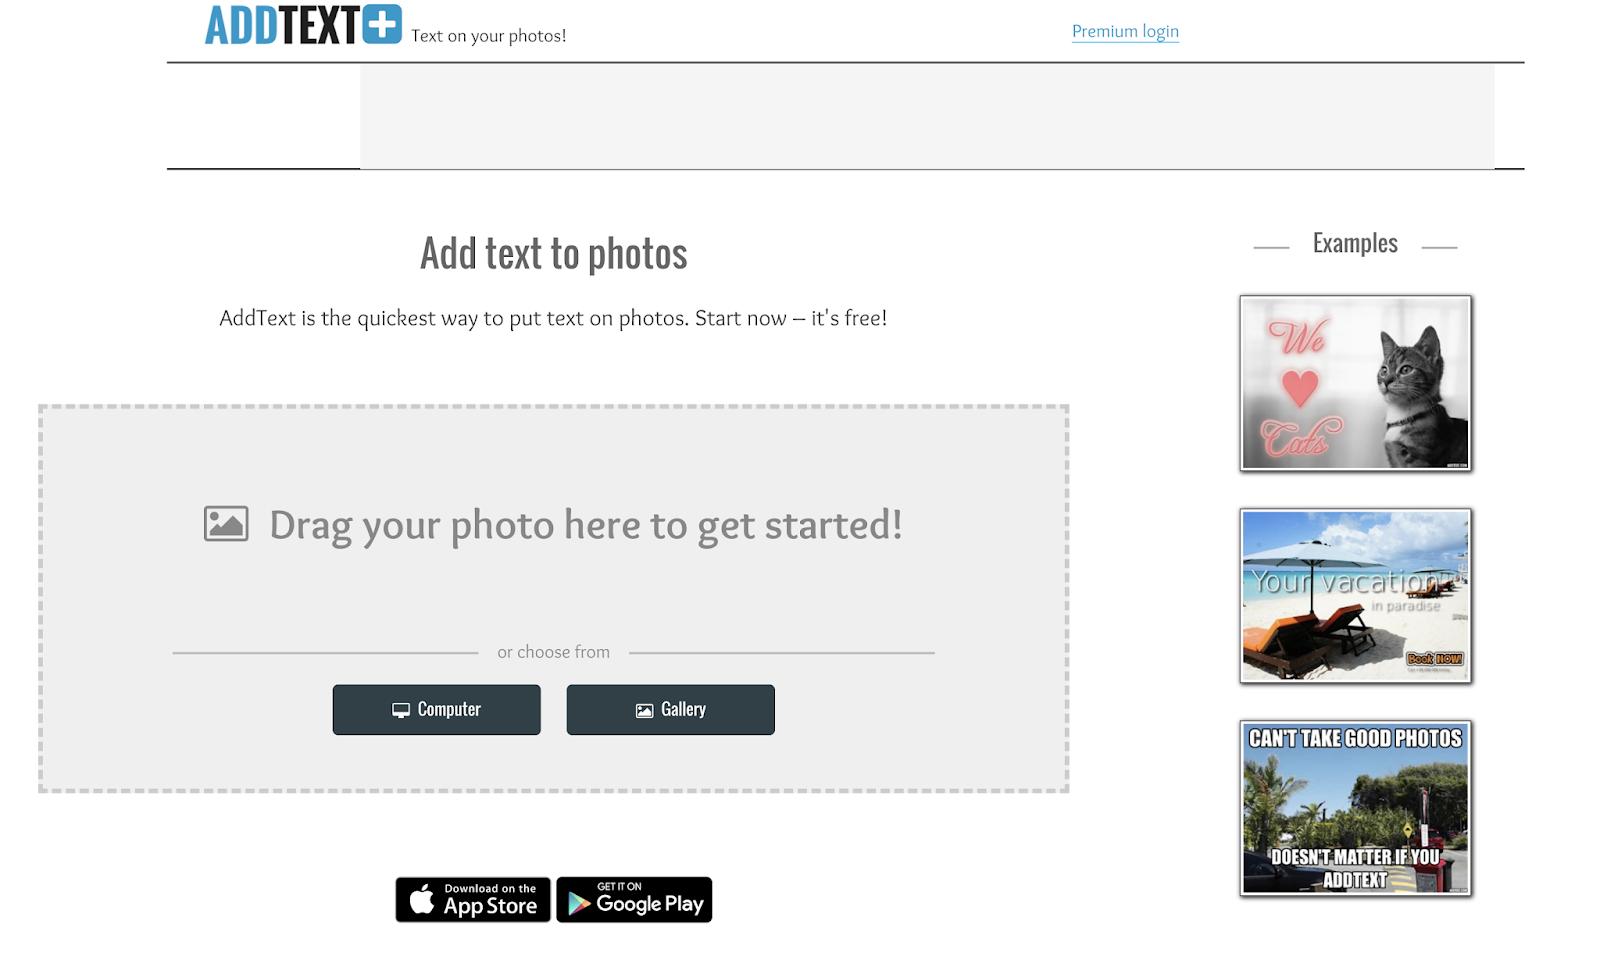 Add Text Image Editor